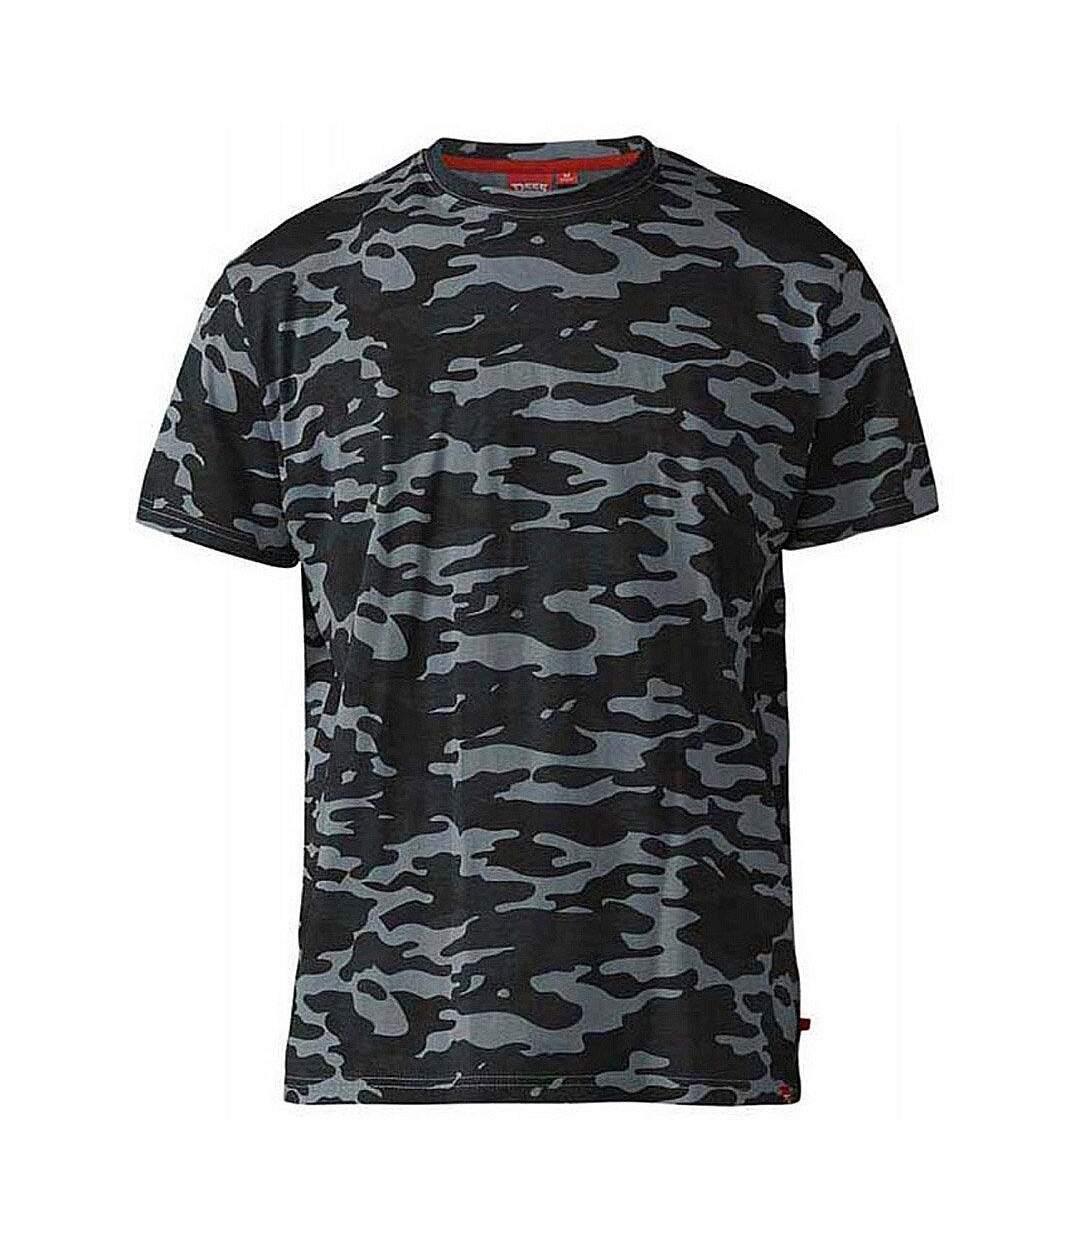 Duke Mens Gaston Kingsize Camouflage Print T-Shirt (Storm) - UTDC195